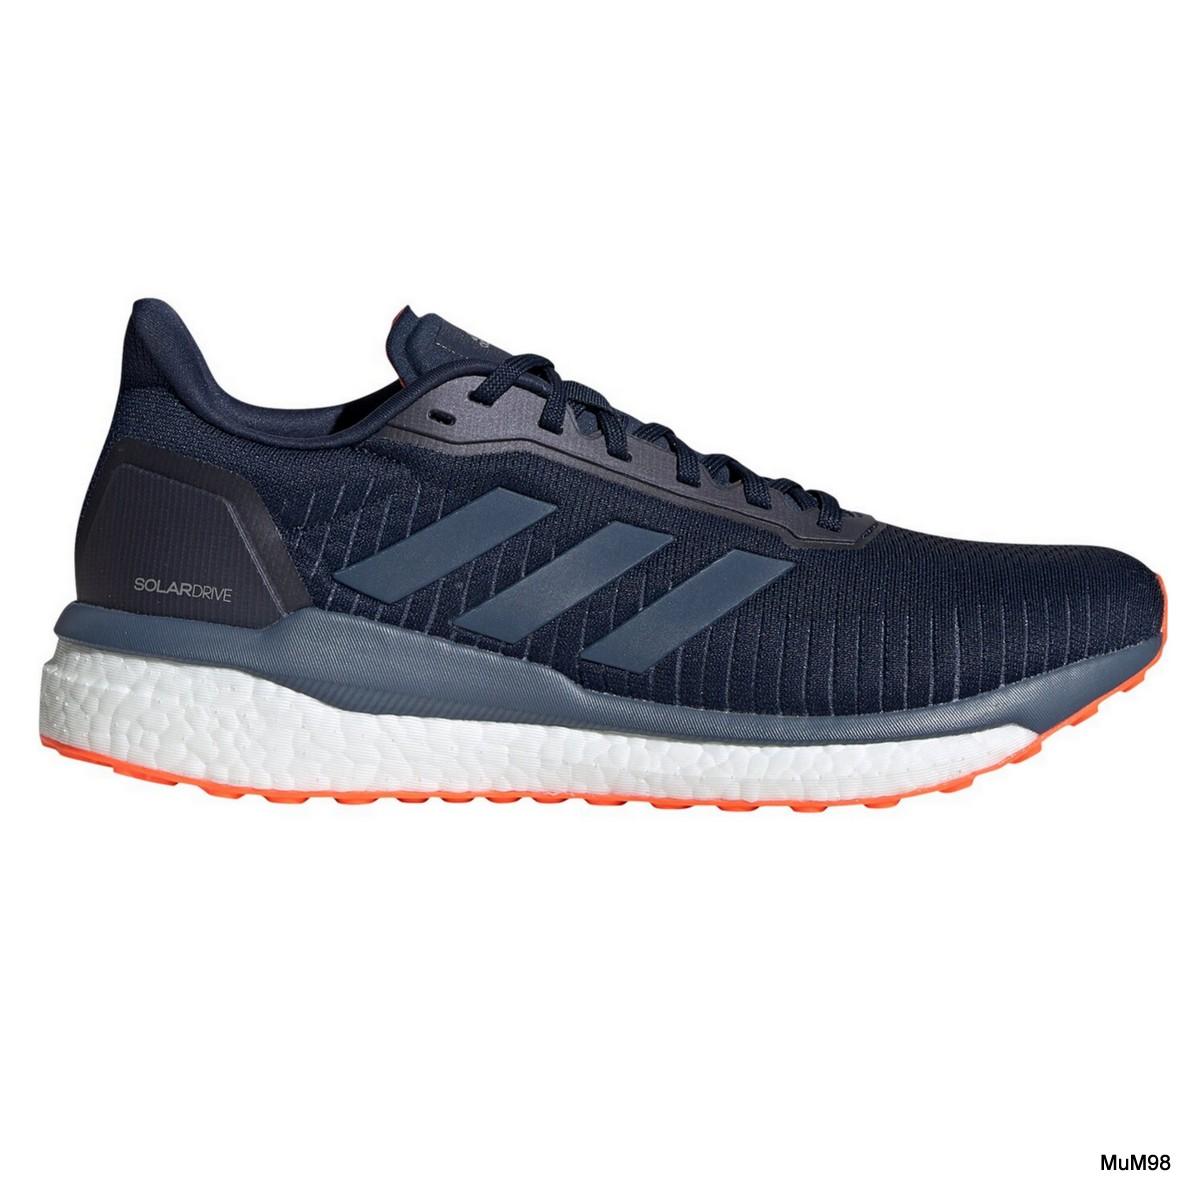 Adidas Herren Runningschuh Solardrive 19